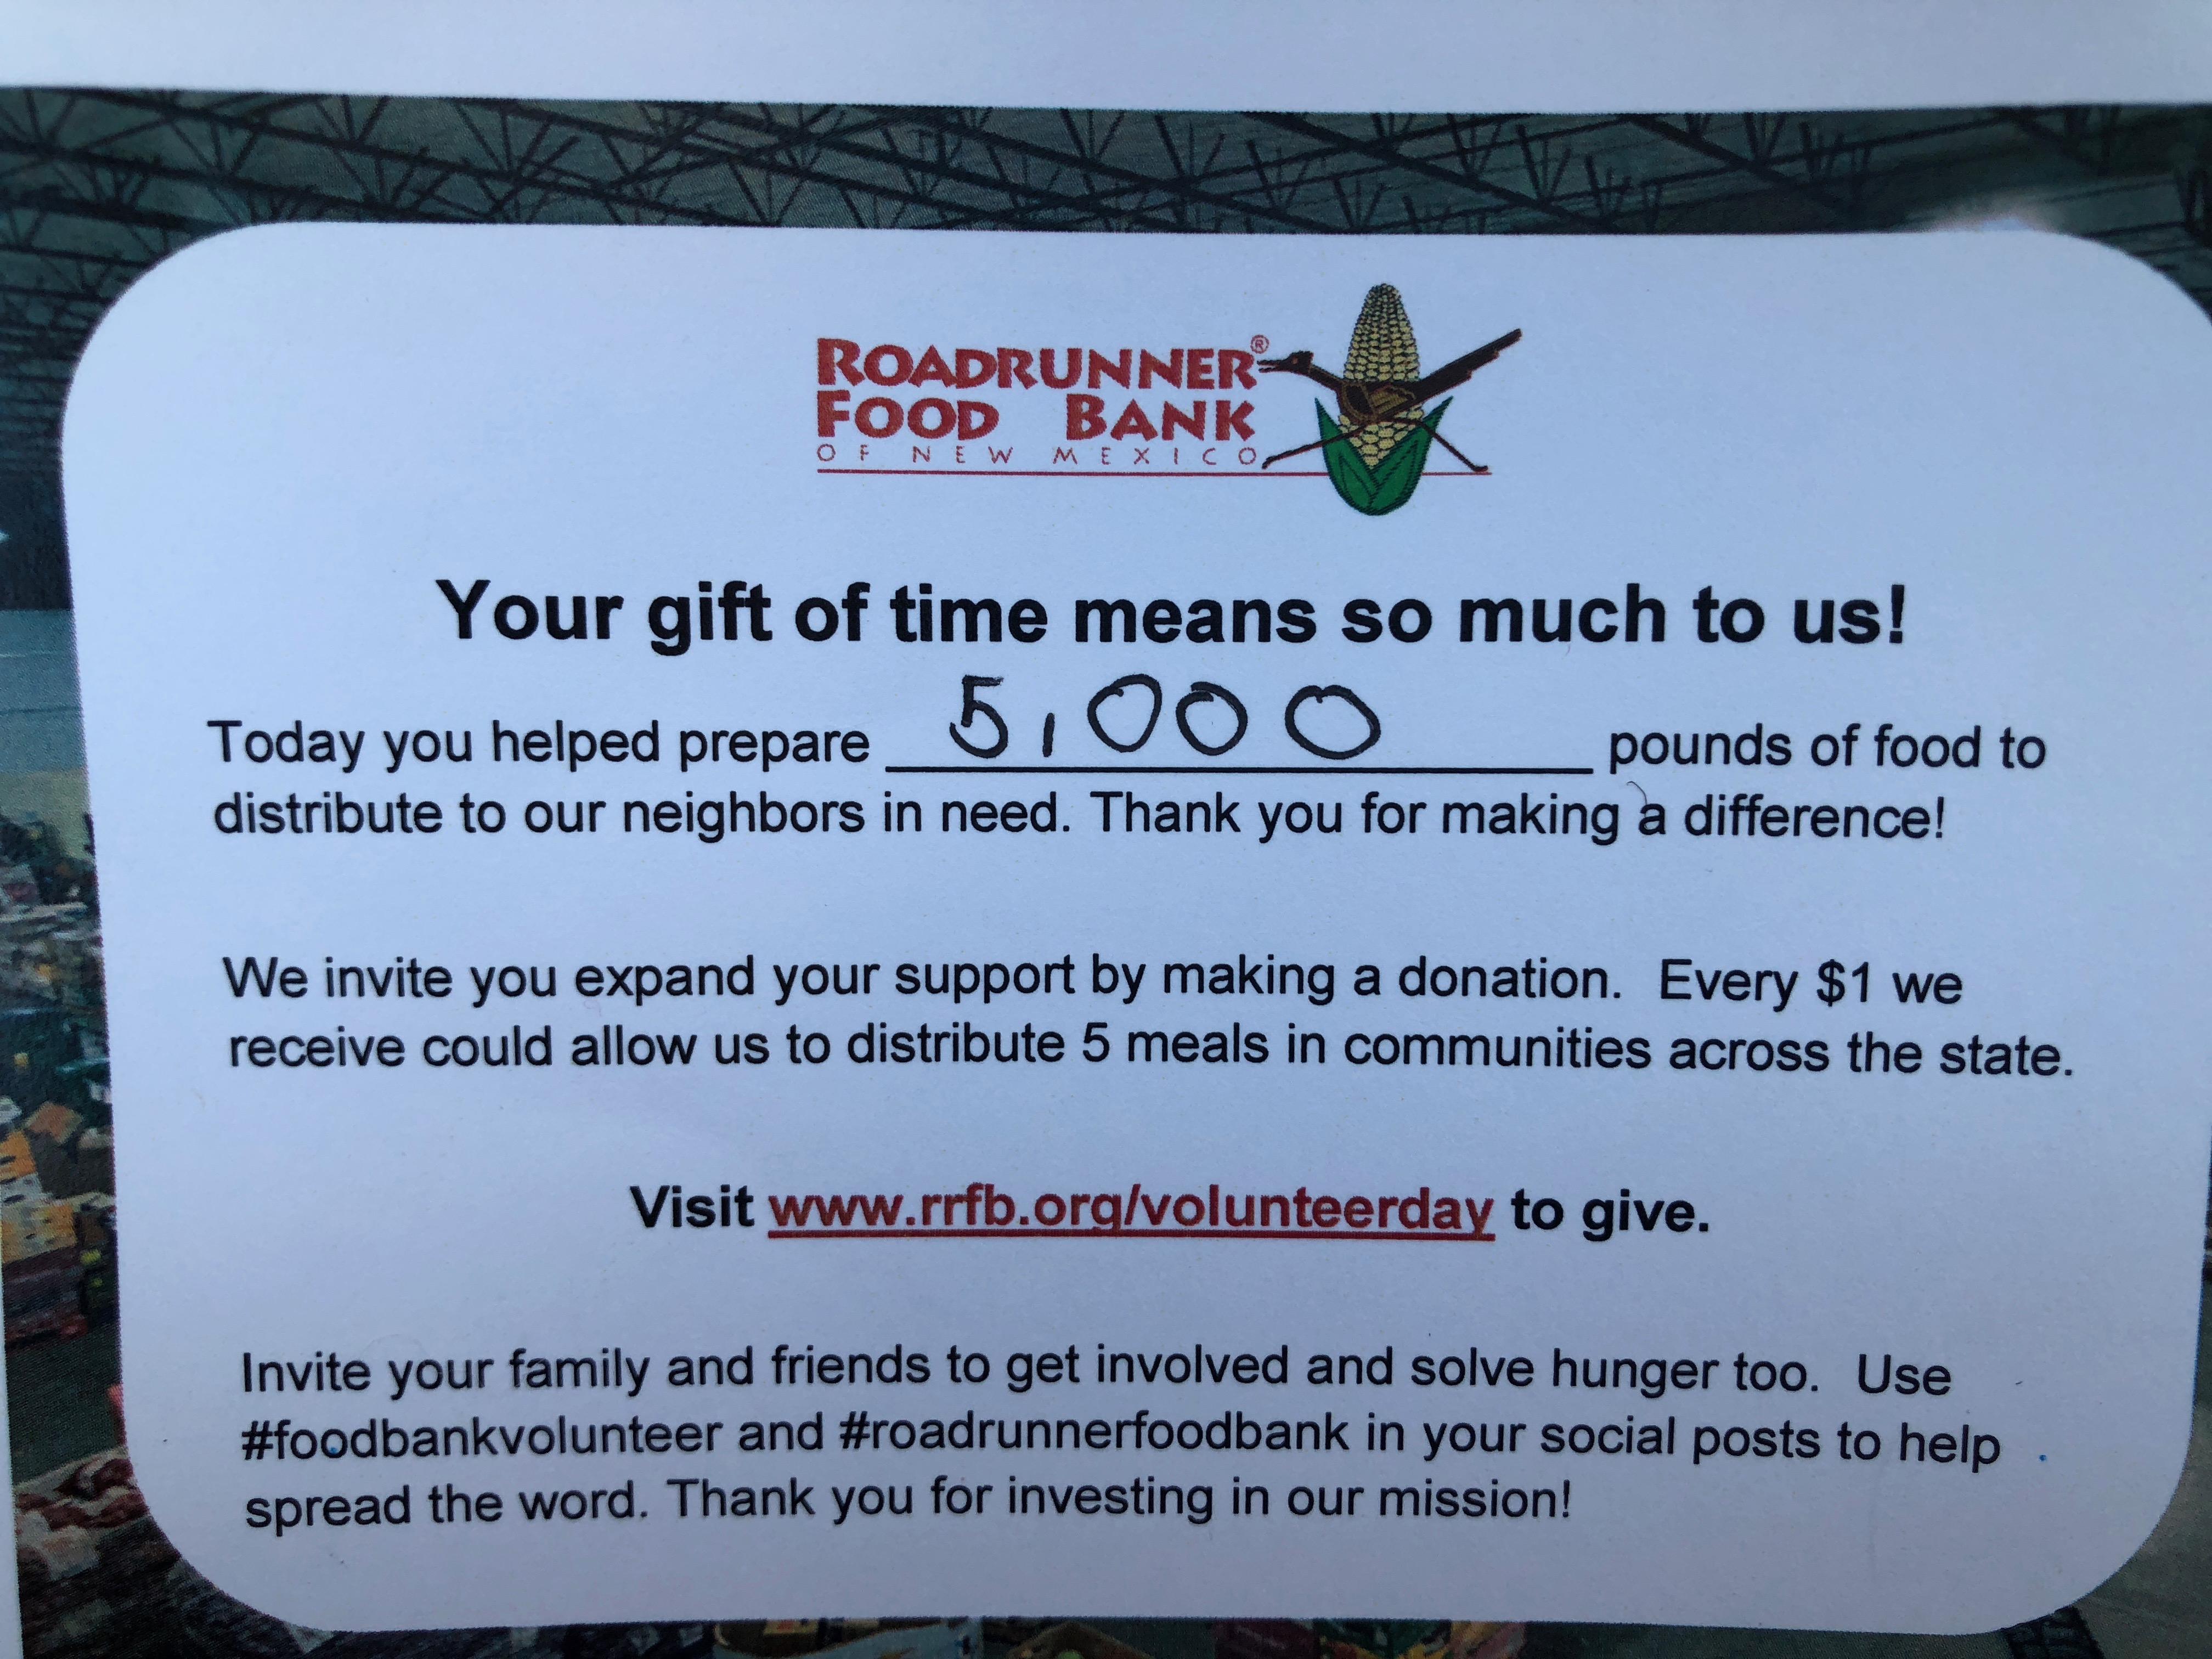 Rio/roadrunner food bank community service